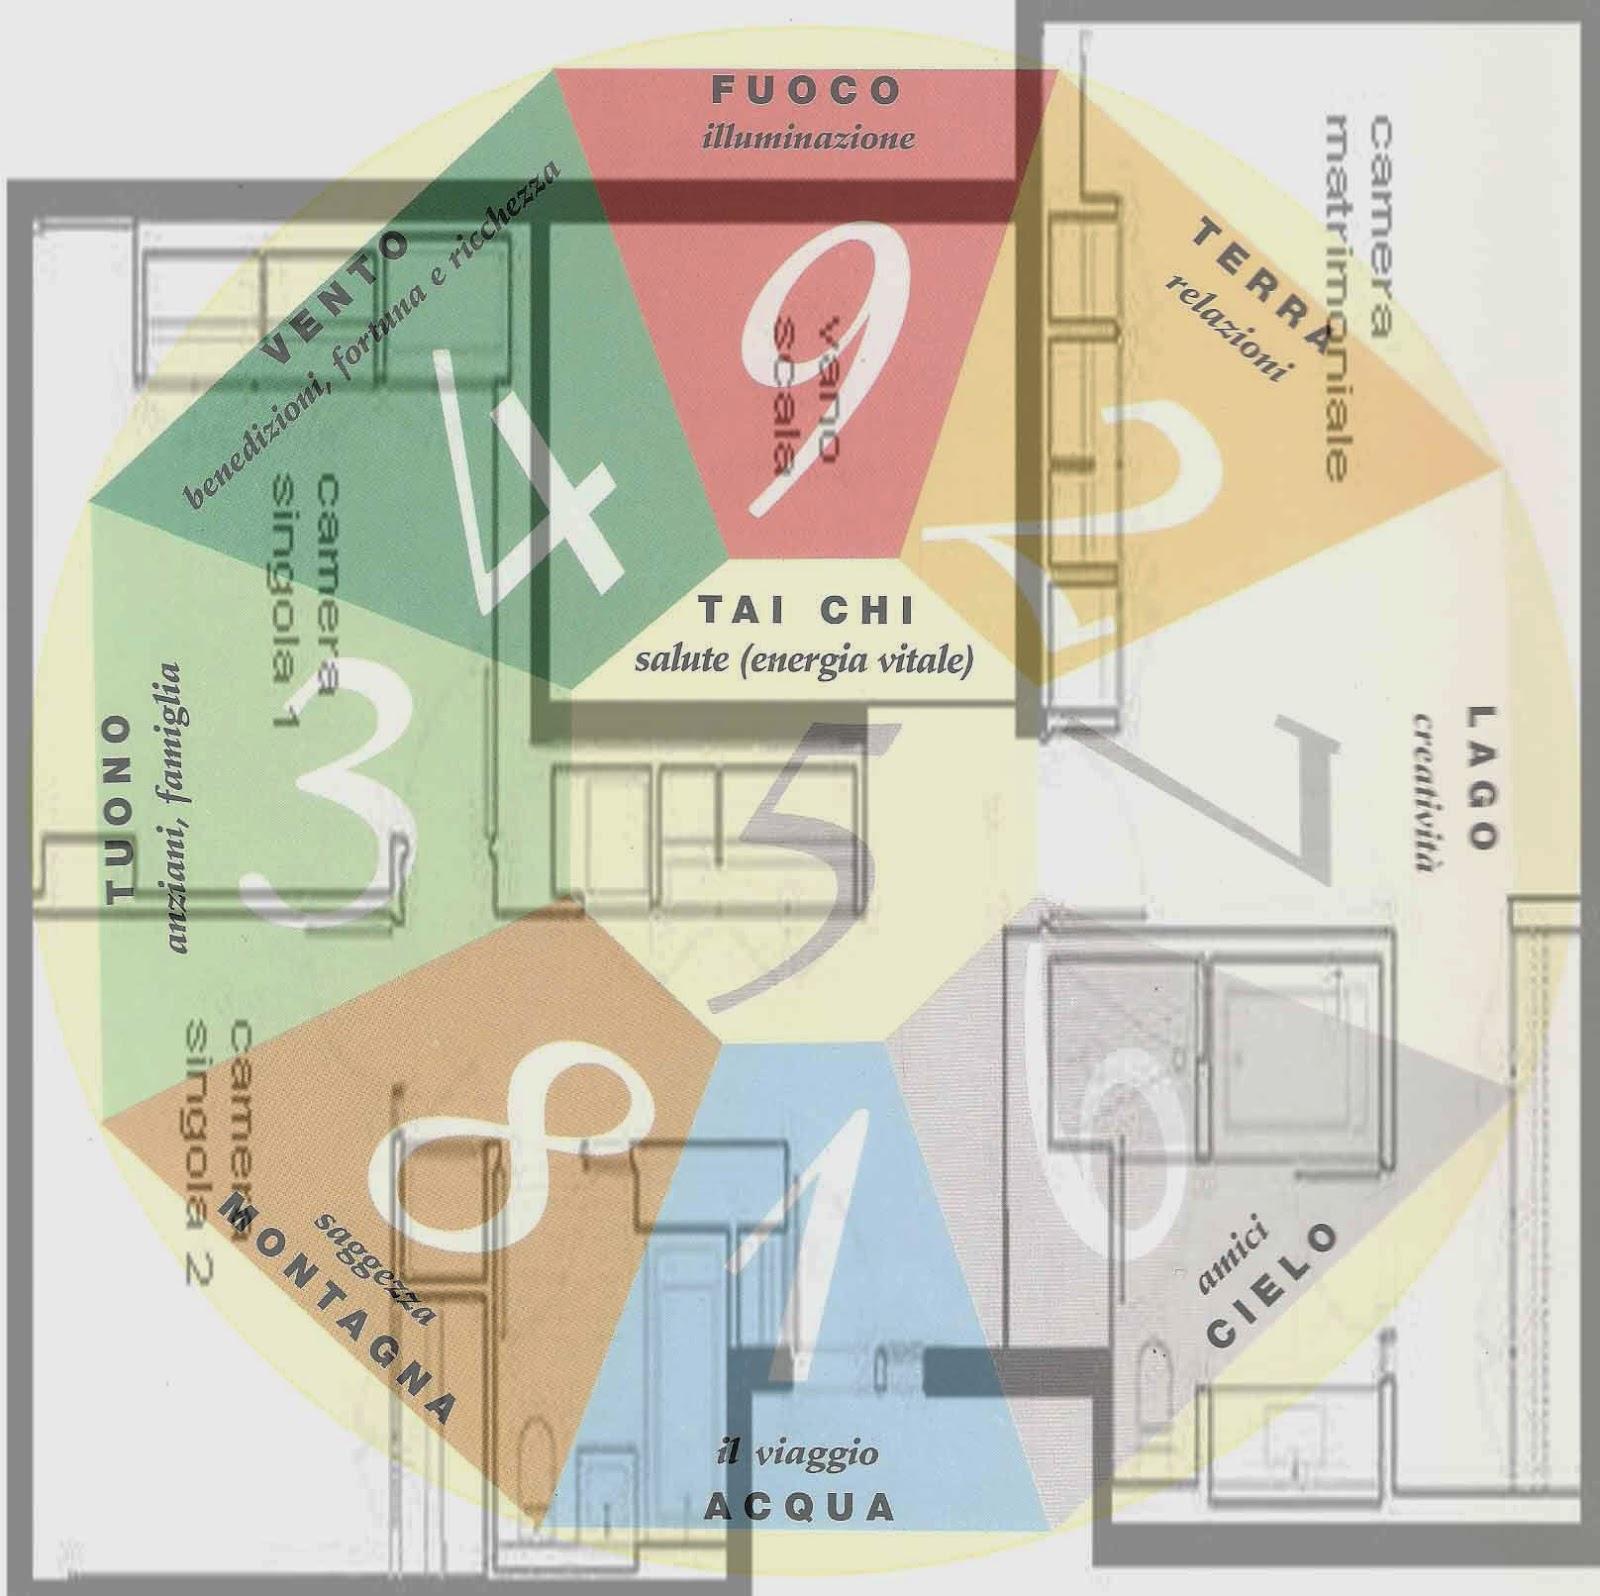 Feng shui appunti casa e giardino michaeldiario for Casas feng shui arquitectura